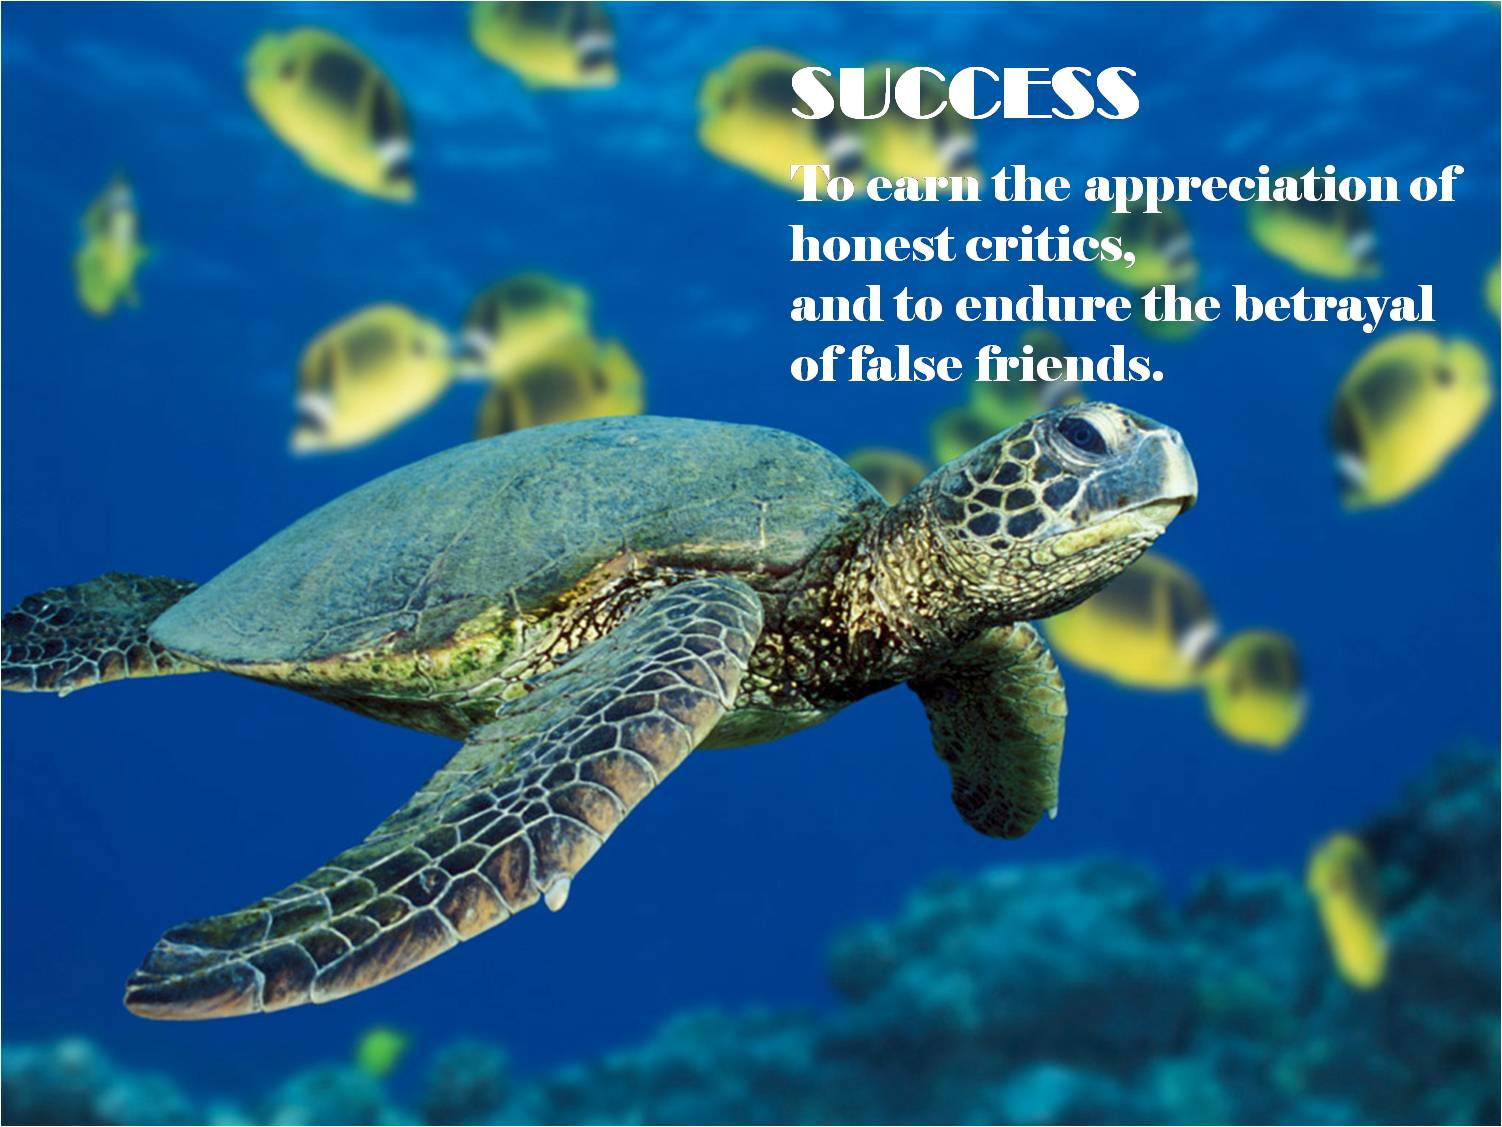 Turtle quote #2